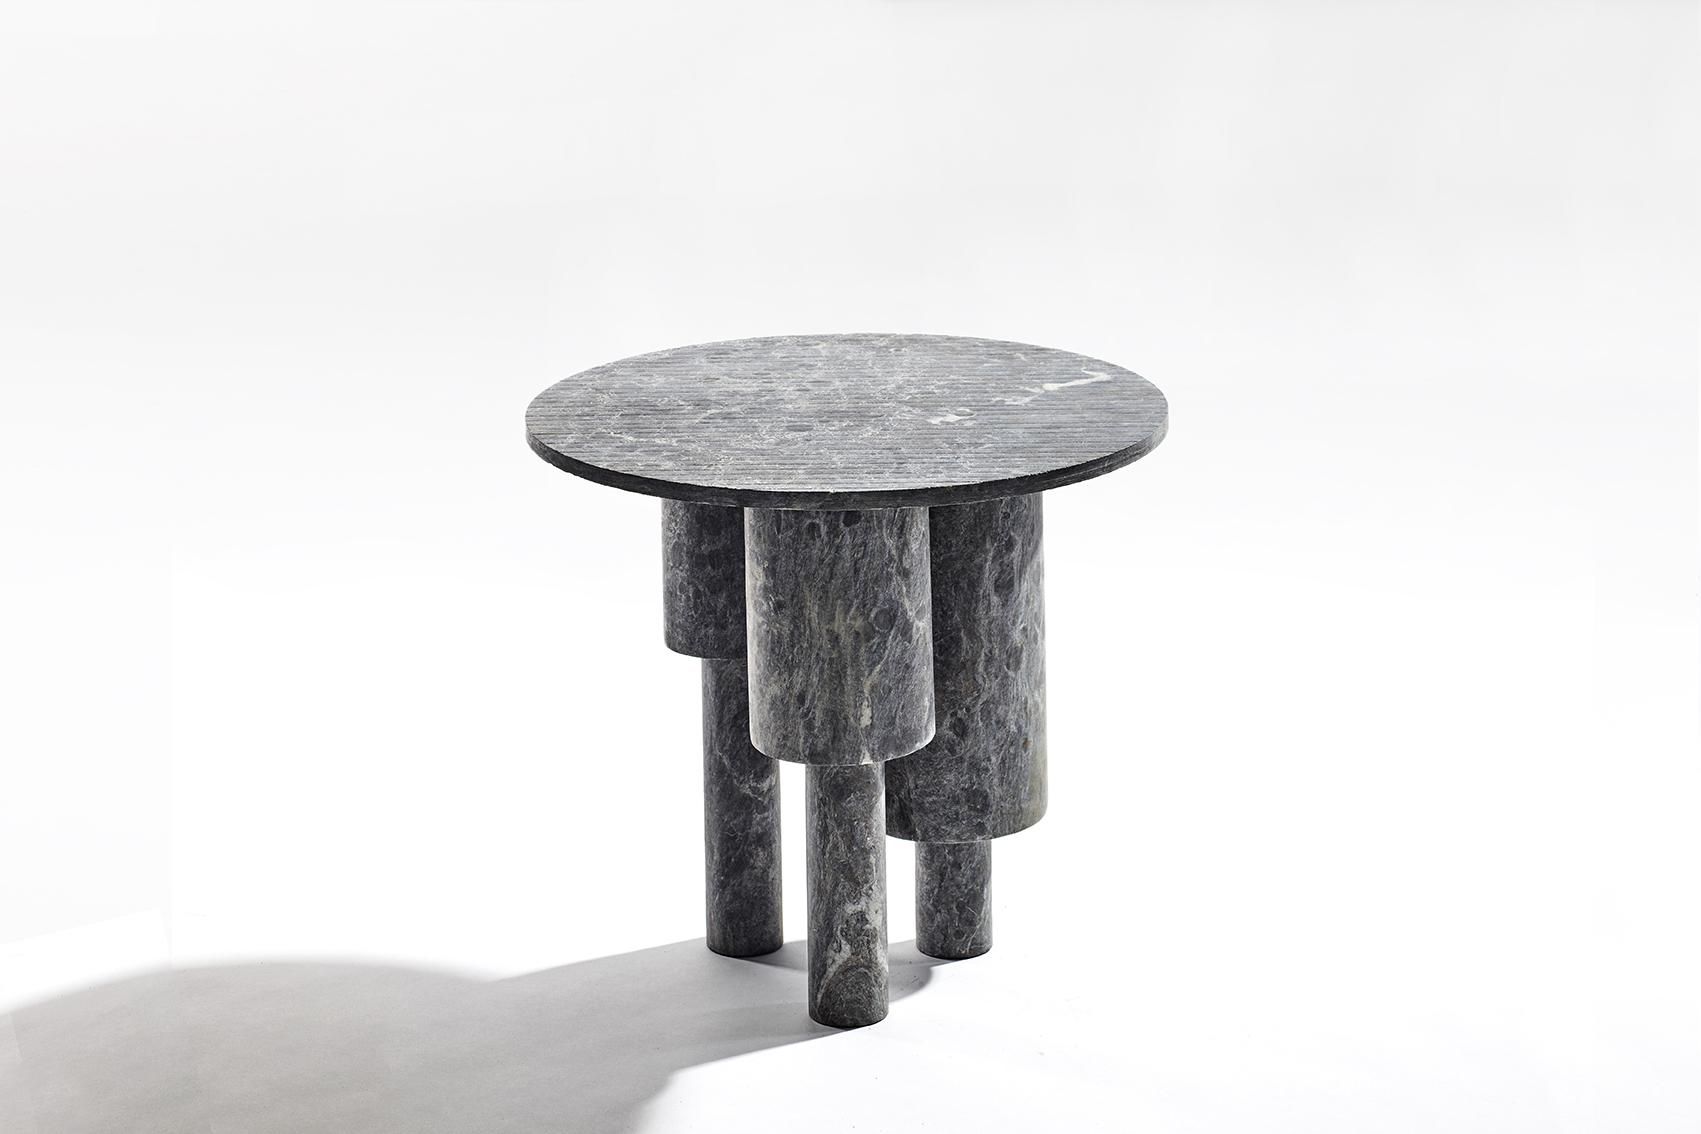 munoz-josefina-design-marble-black_tables-5.jpg